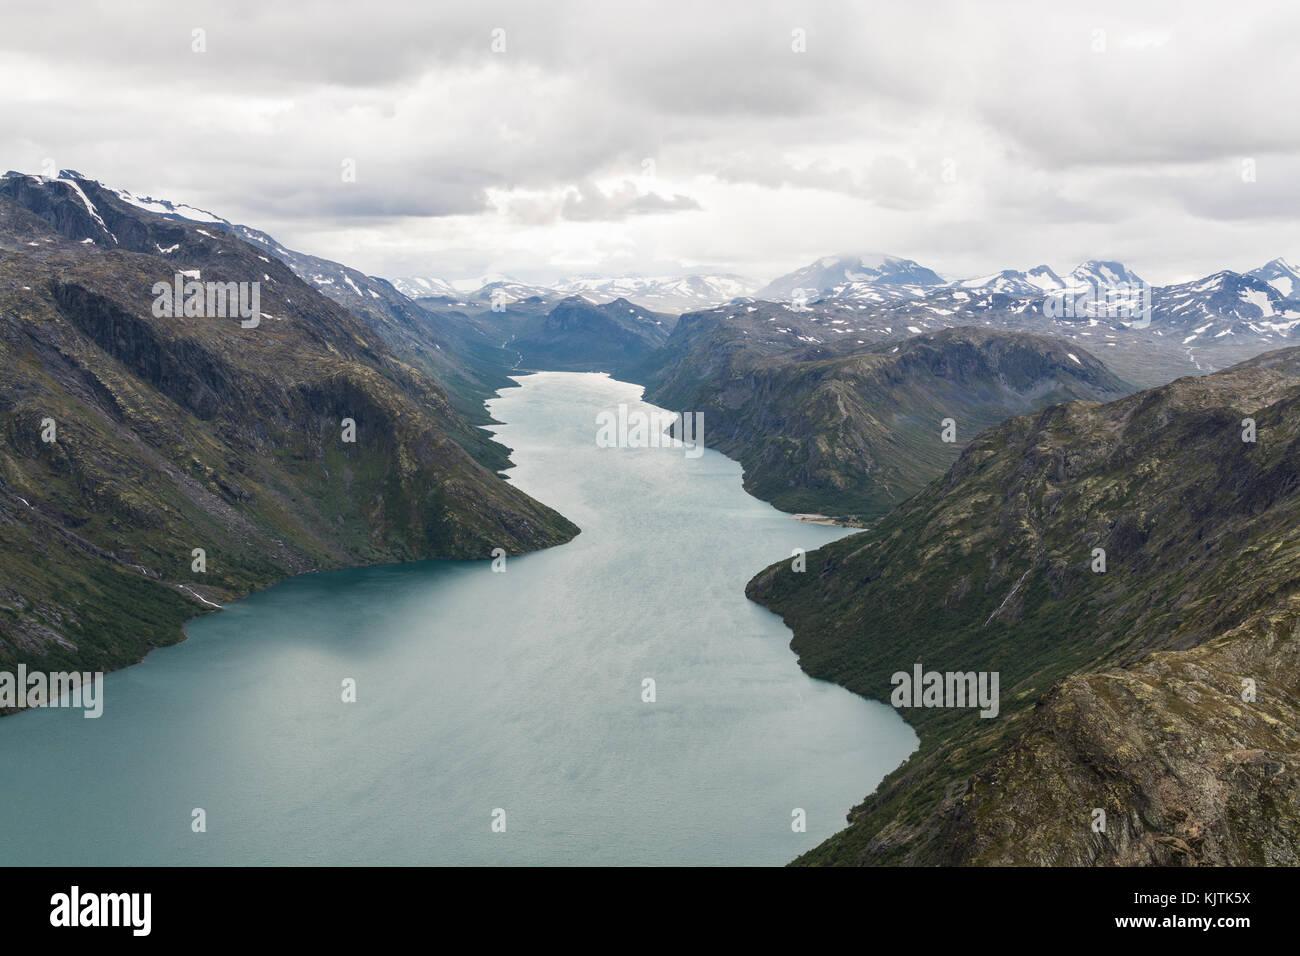 View from Besseggen ridge over Gjende lake and Memurubu, Norway - Stock Image